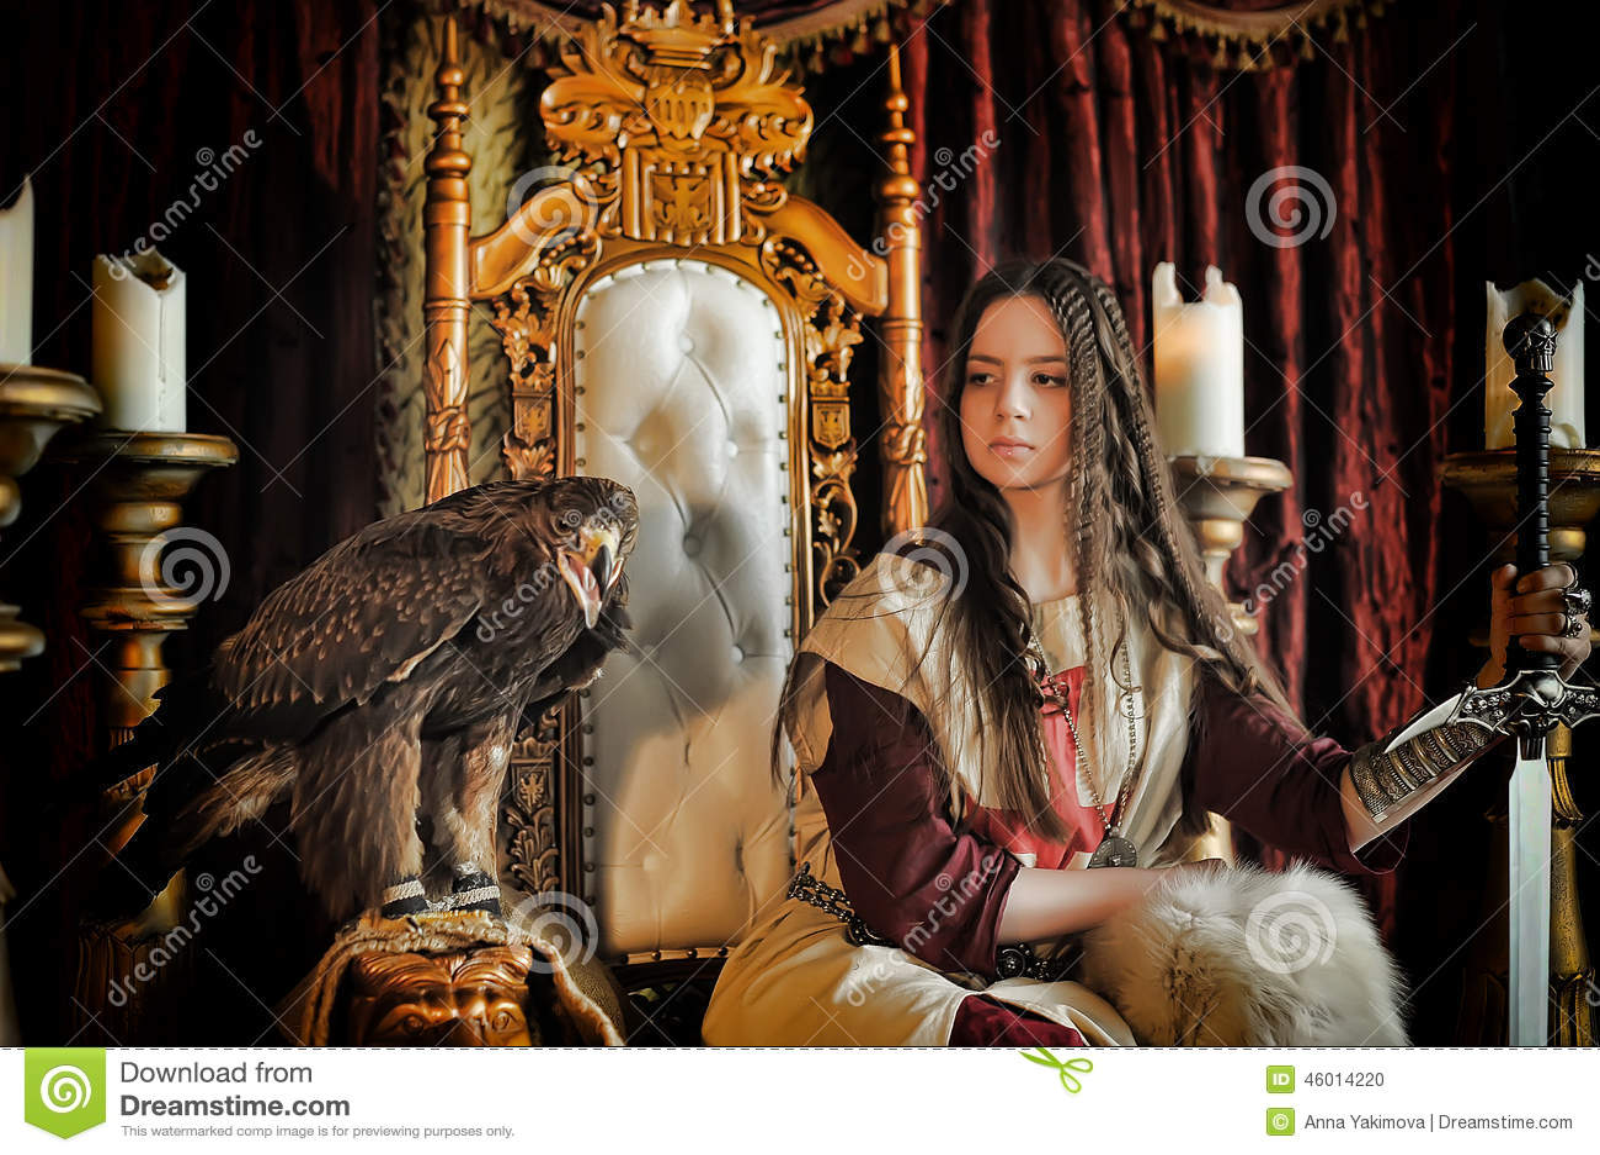 Warrior Princess On The Throne Stock Photo Image 46014220